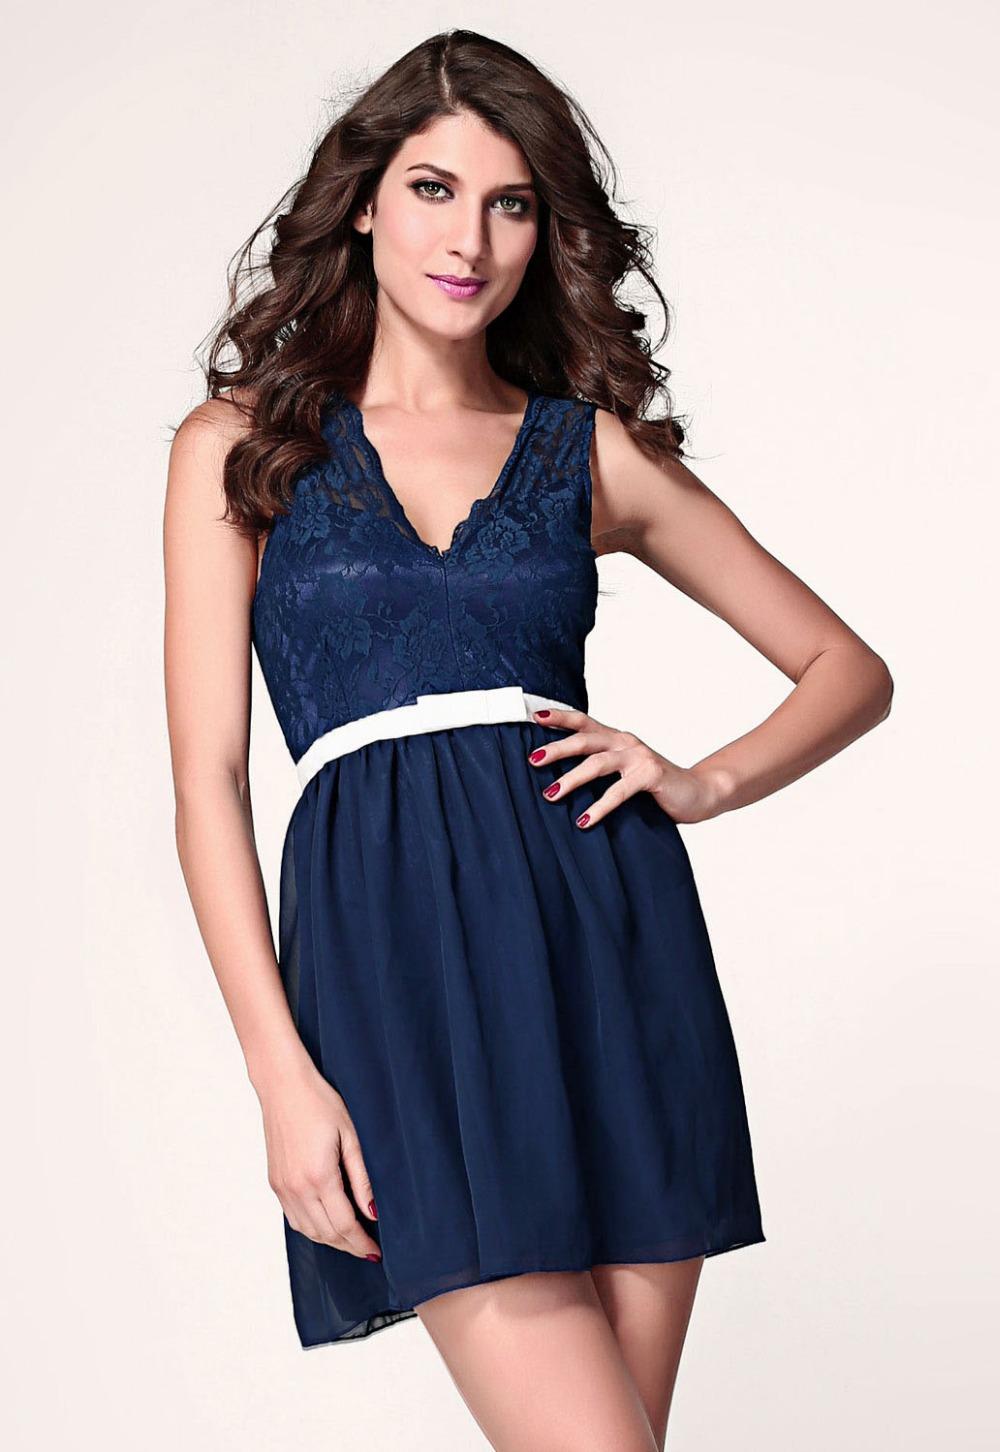 74753cb989 Get Quotations · wholesale popular women dress 2014 Navy Scalloped Lace  Skater Dress zapatillas dress free shipping